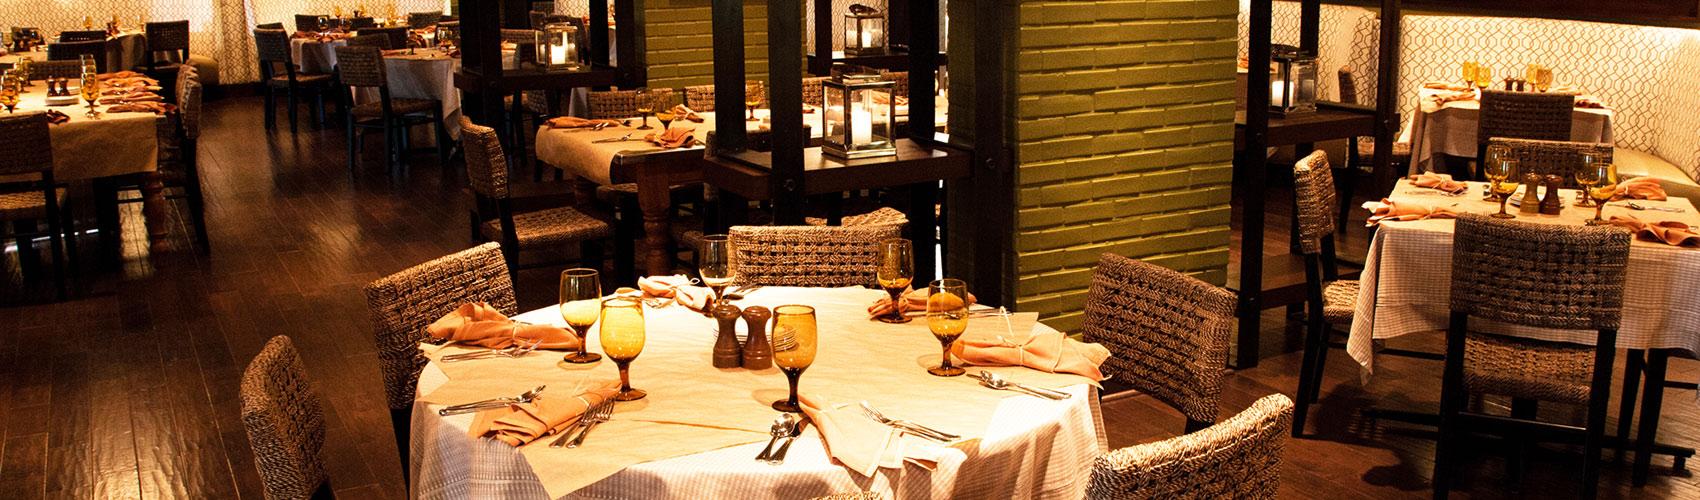 The Italian Restaurant main room